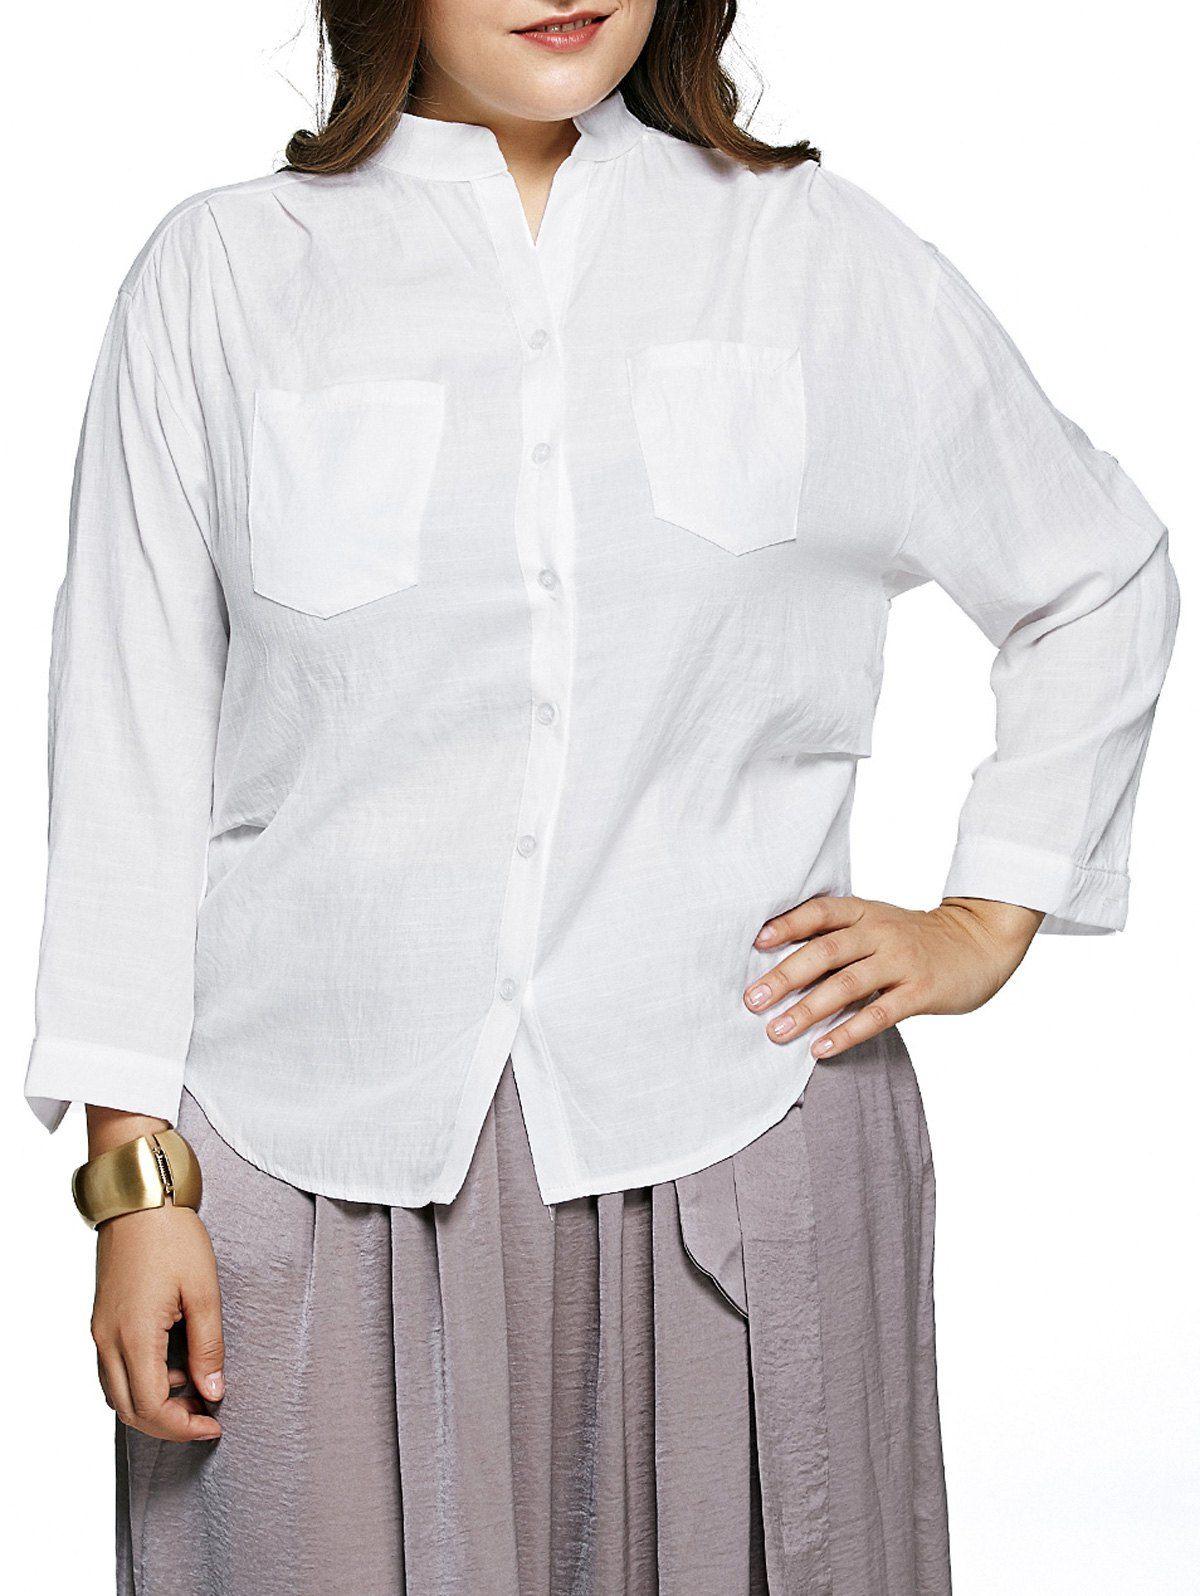 Simple pure white pockets design plus size blouse click clothing